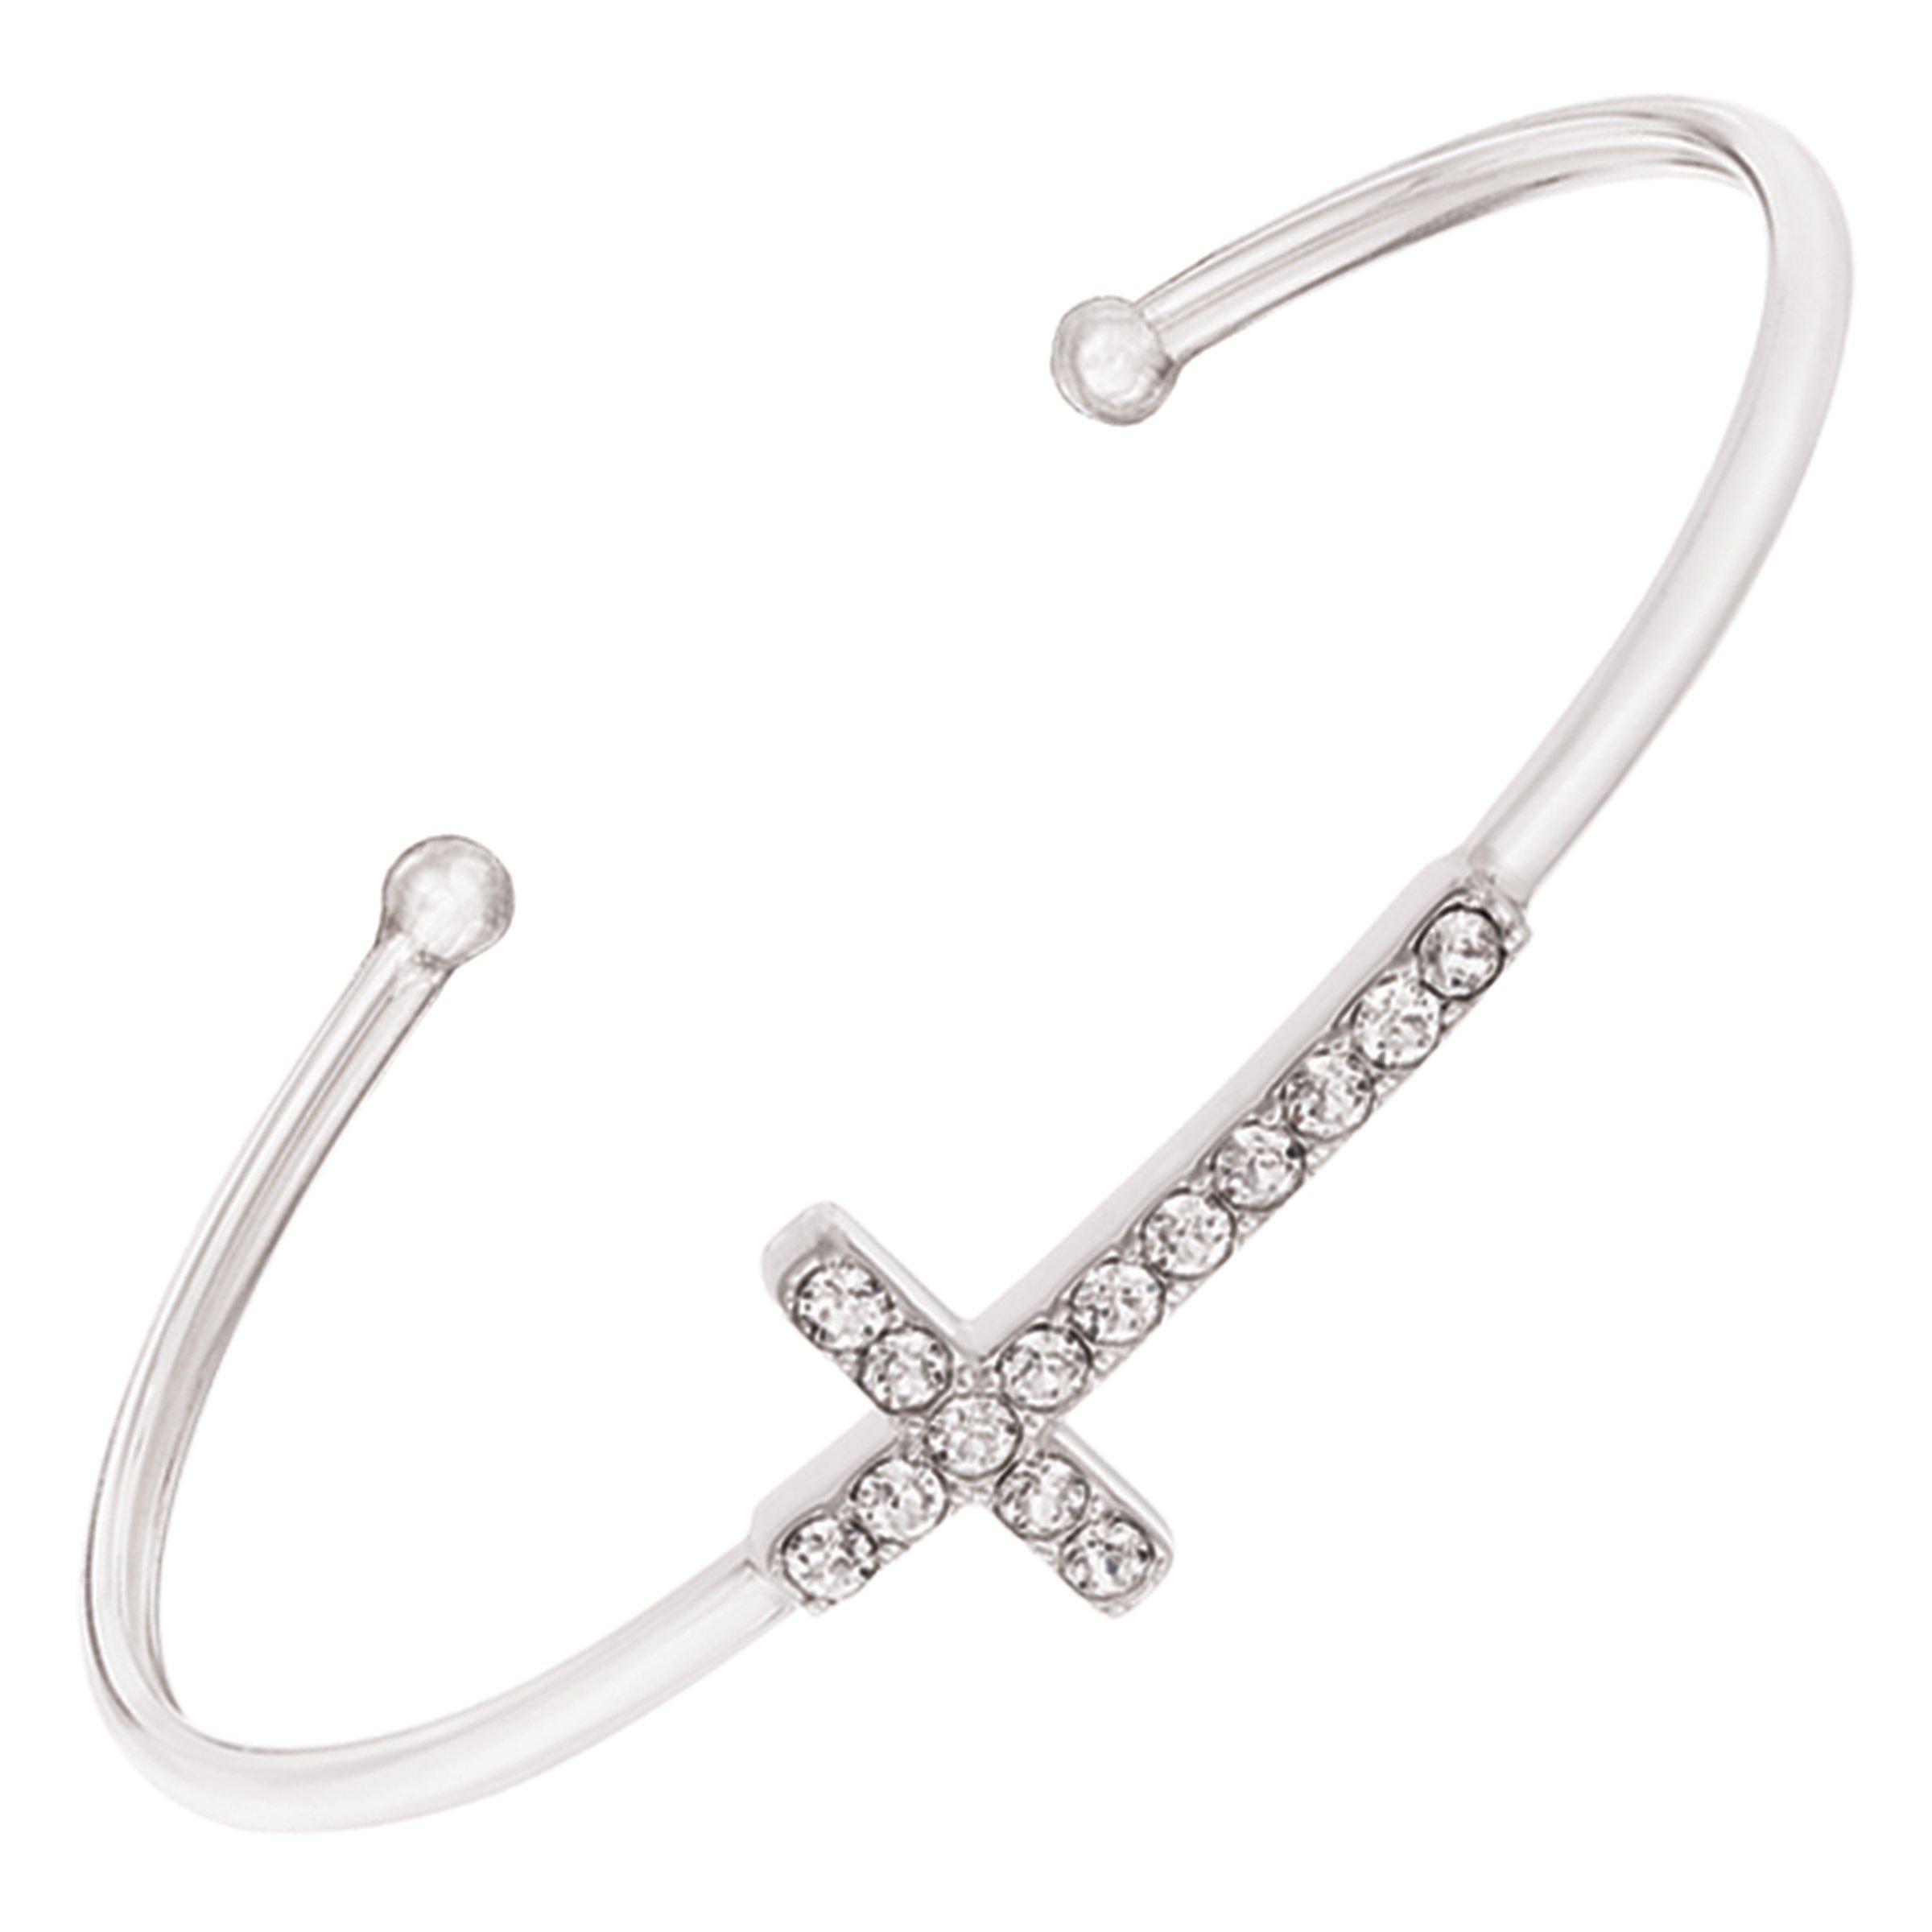 Silpada 'Cross' Cuff Bracelet with Swarovski Crystals in Sterling Silver, 6.75''